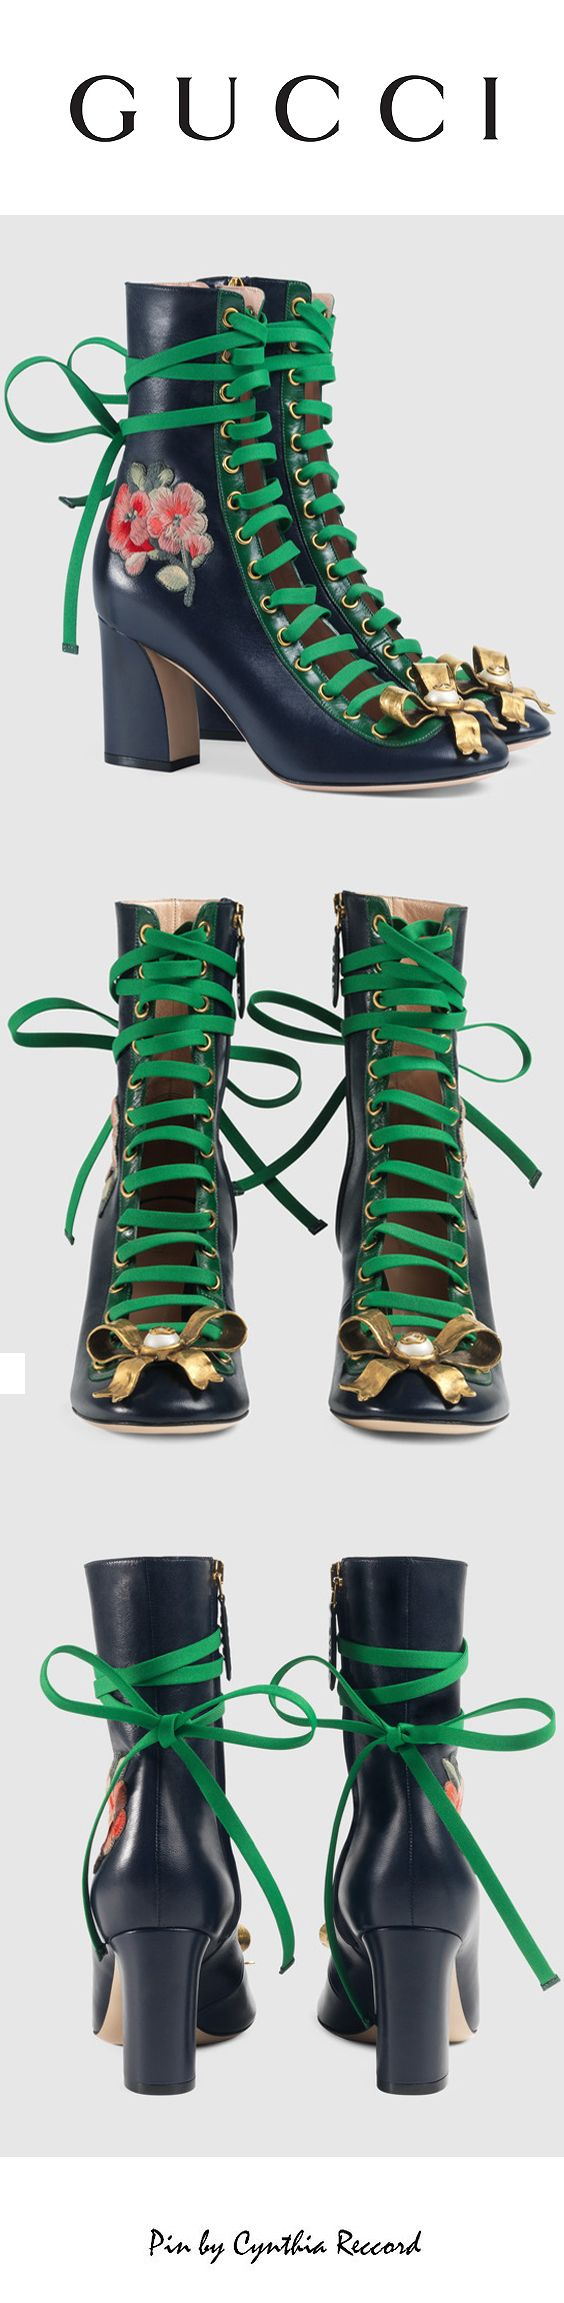 Gucci | SS 2016 Collection | cynthia reccord                                                                                                                                                                                 More